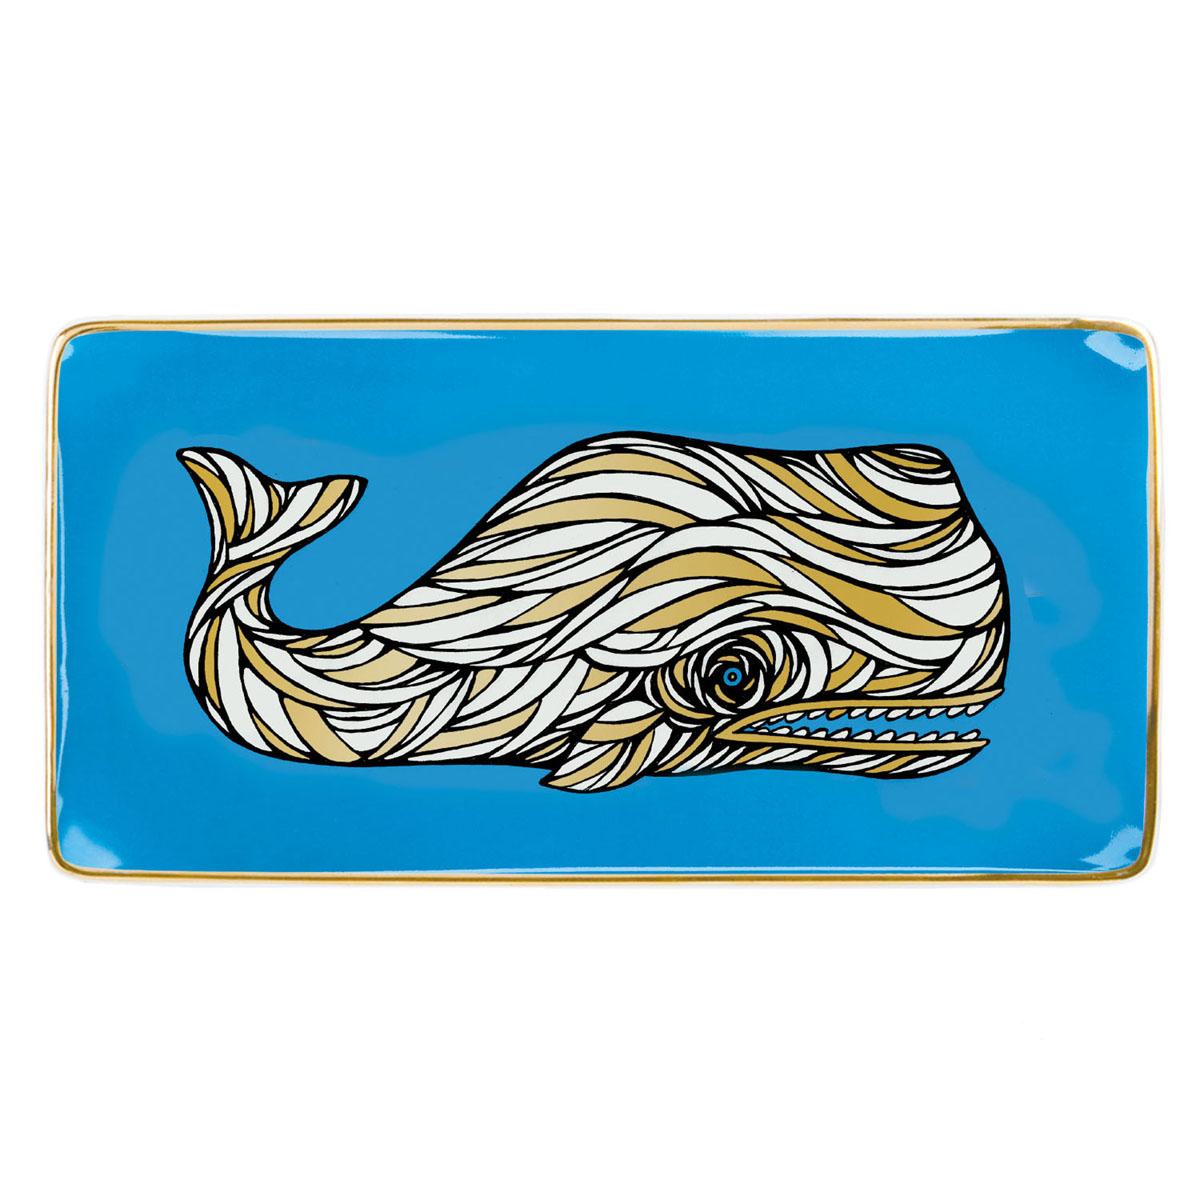 Whale Trinket Tray